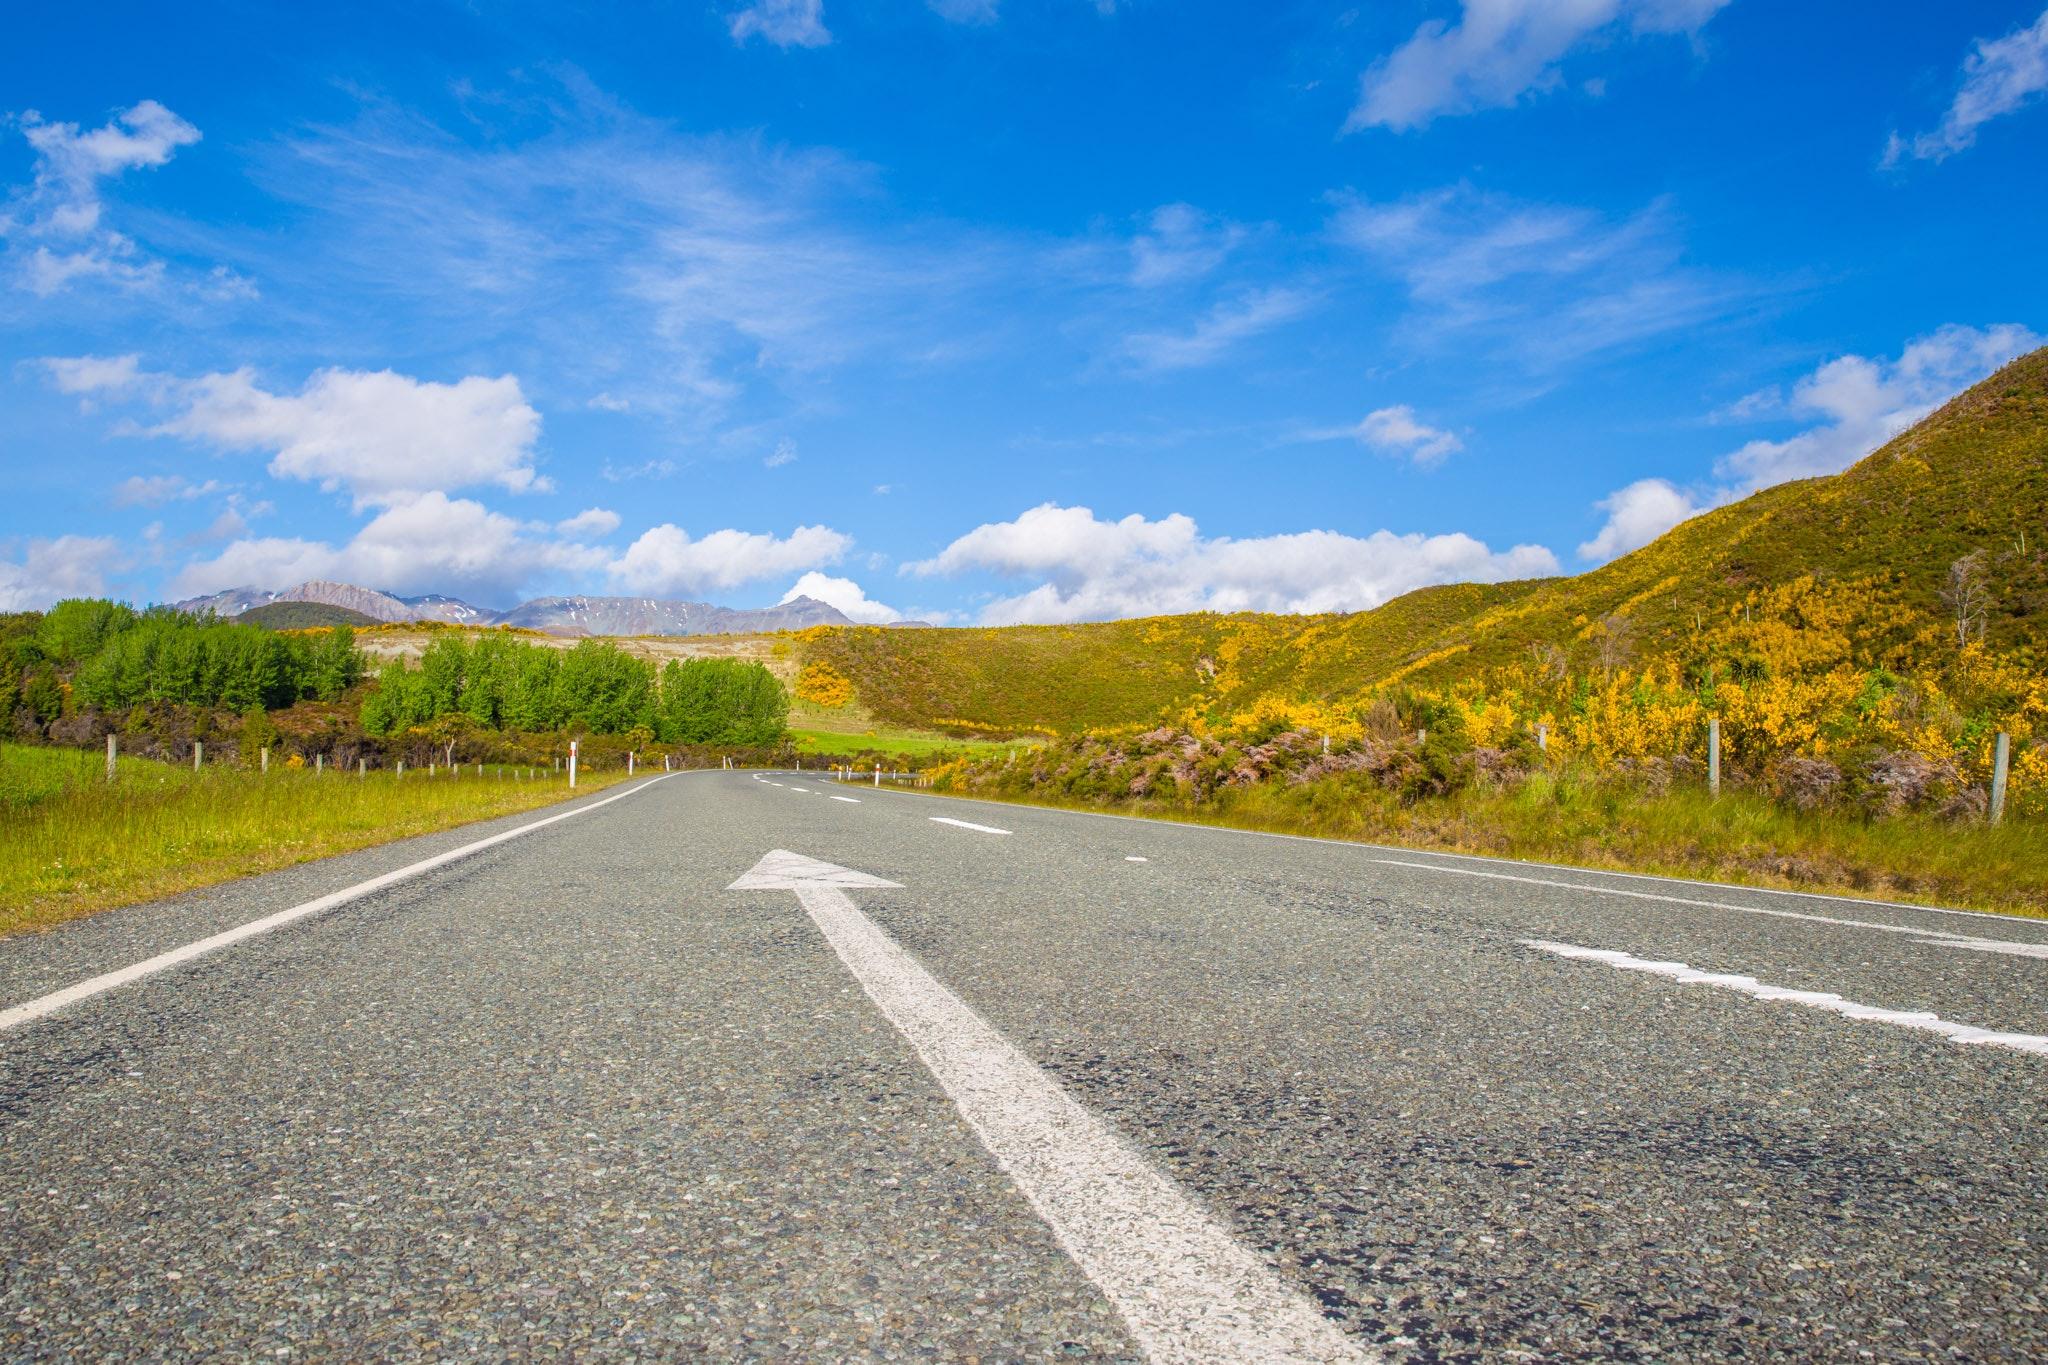 Road Passing Through Landscape Against Blue Sky, Arrow, Mountains, Travel, Summer, HQ Photo